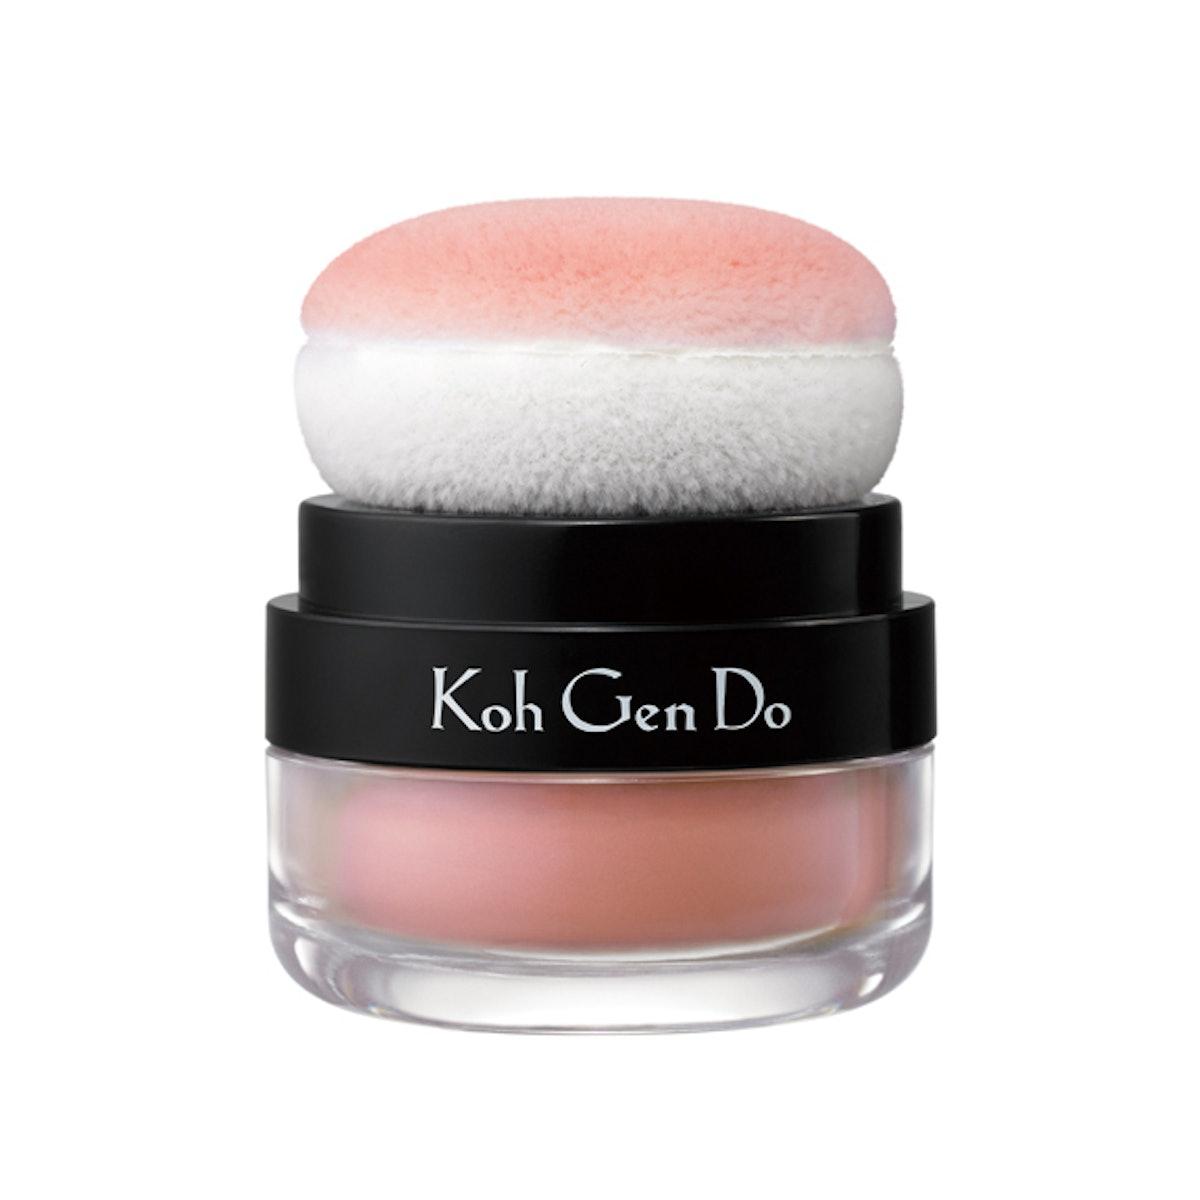 Koh Gen Do Fresh Face Cheek Color